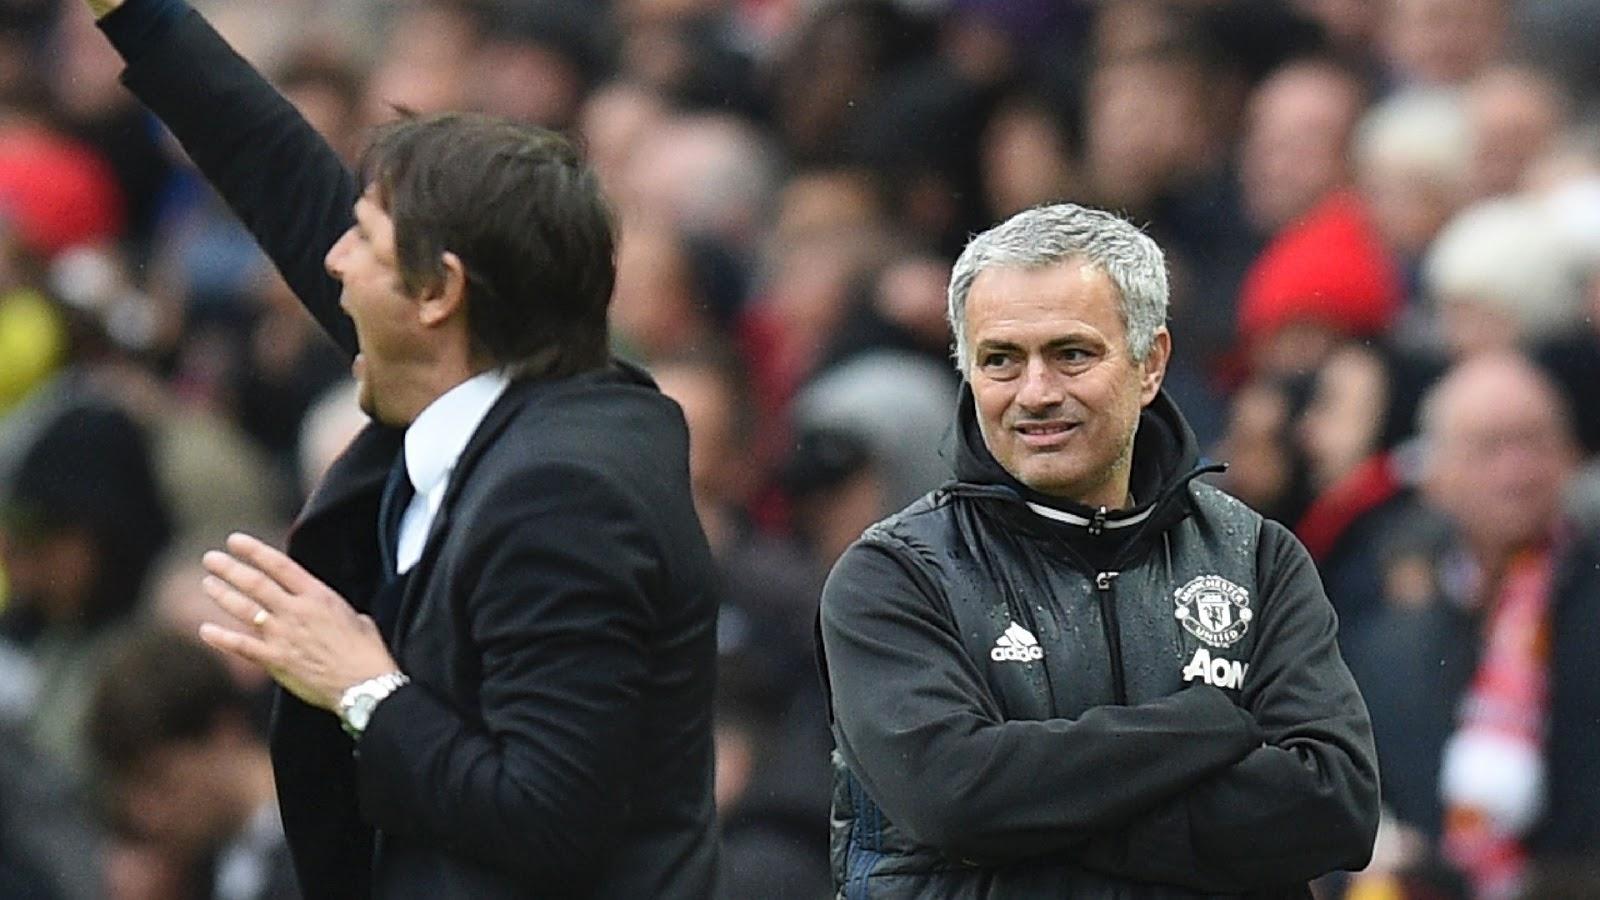 Mourinho-phan-bac-Conte-khi-bi-goi-la-ke-mat-tri